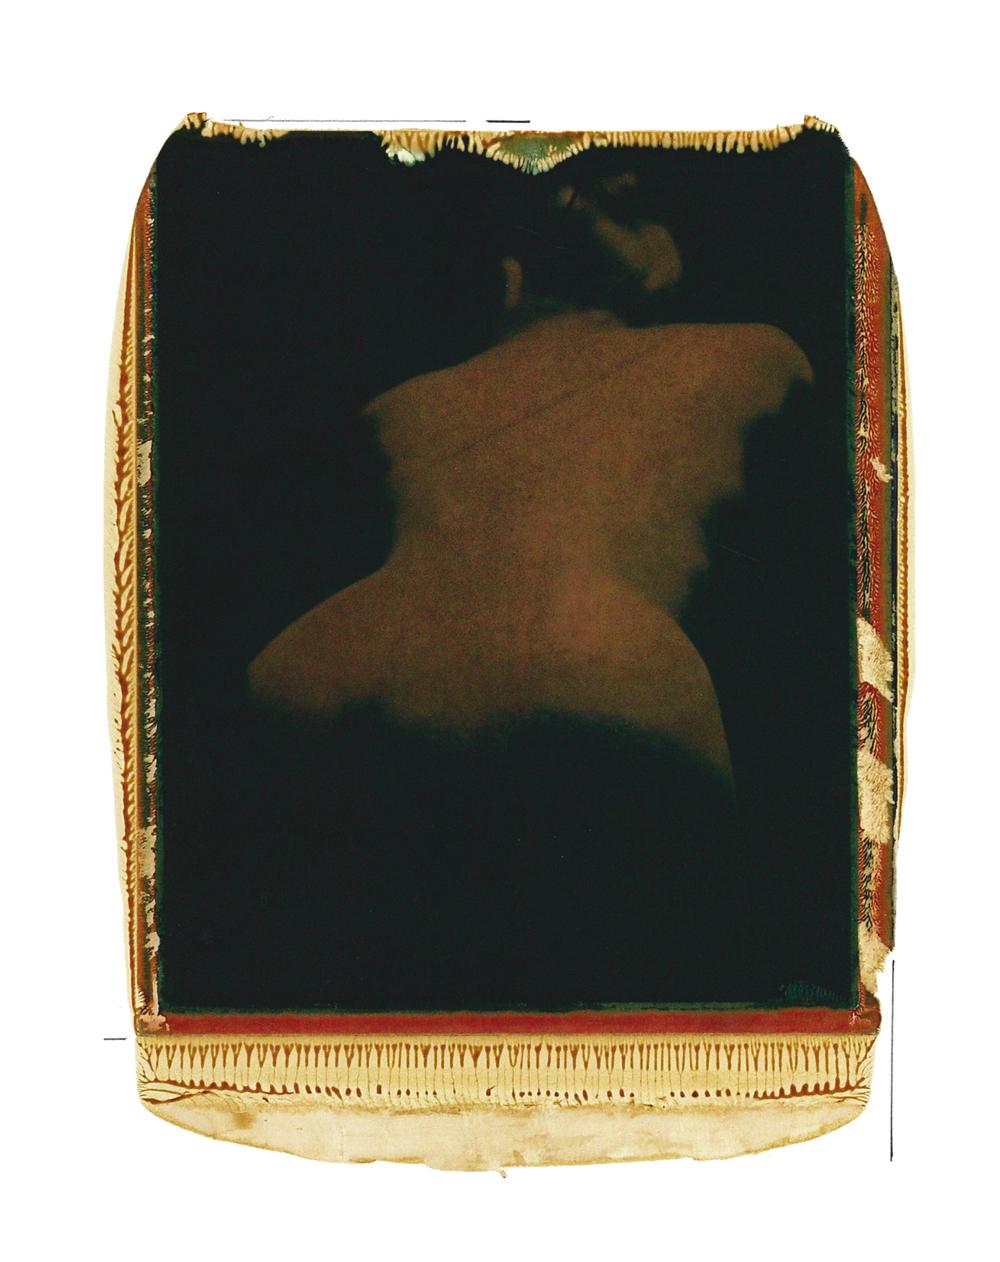 GIOLI_POLAROID 2004-63.png